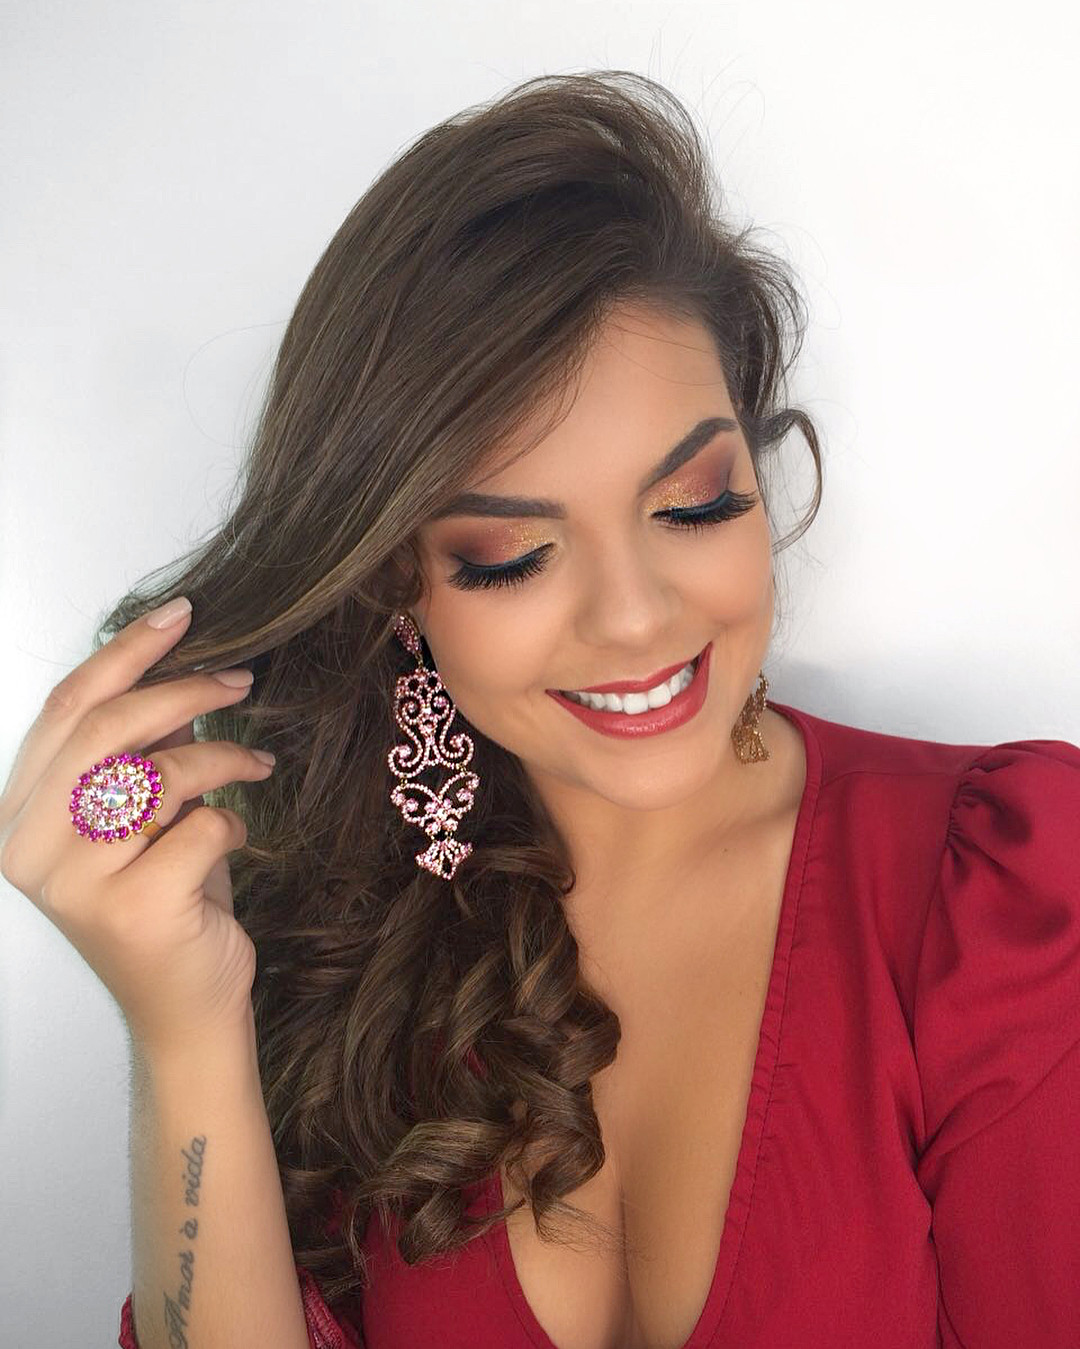 jessica poeta lirio, miss friendship brazil 2021/top 10 de miss tourism queen international 2015. - Página 10 Bzlo1r10